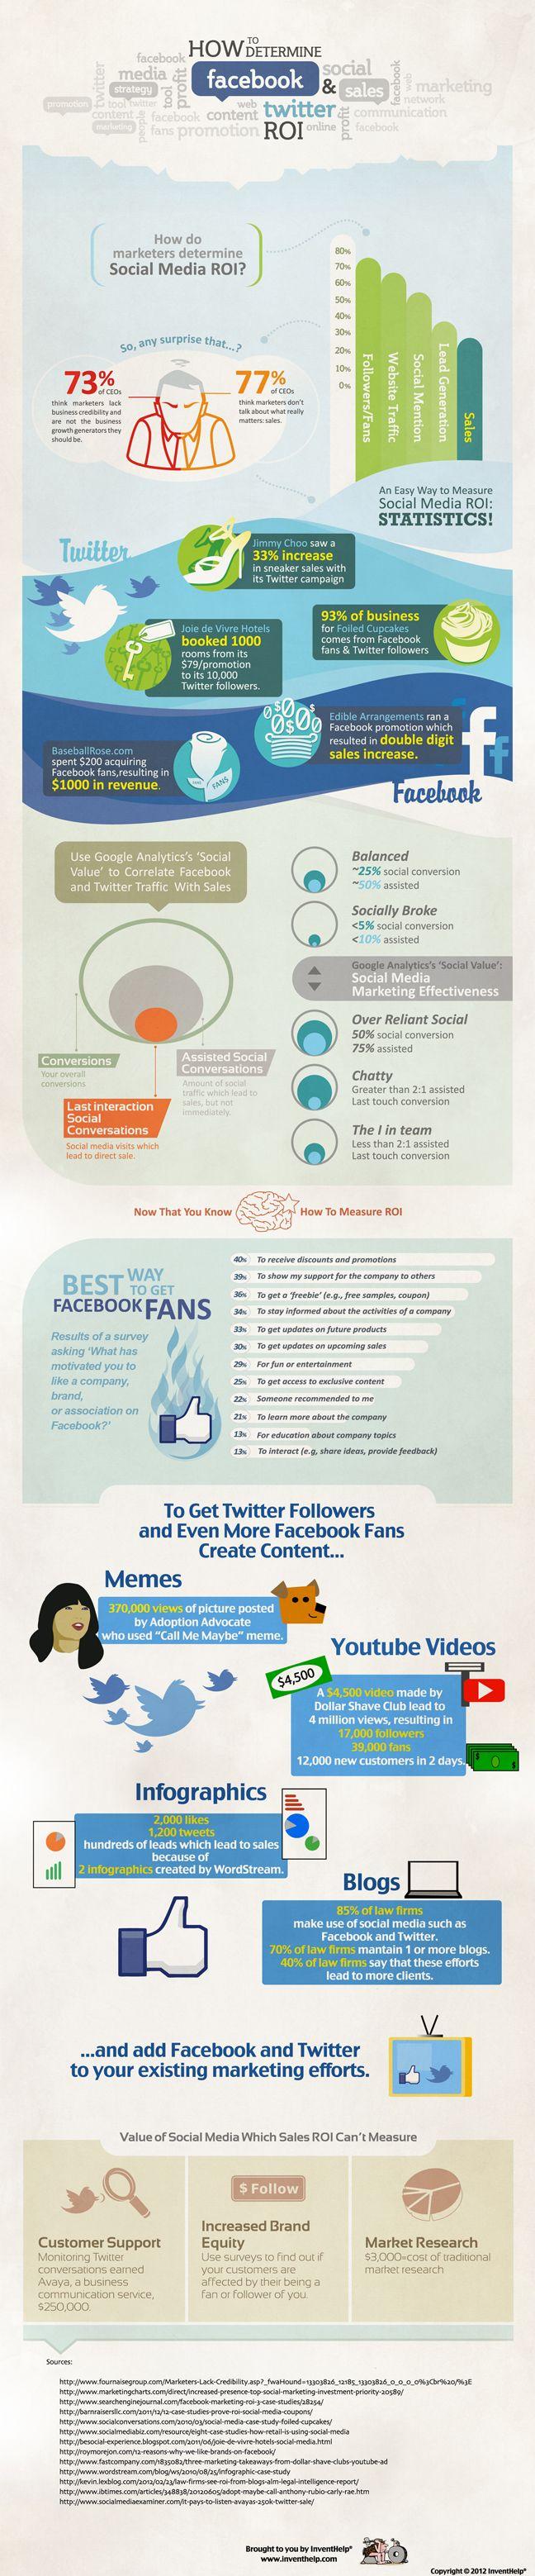 How to determine Facebook & Twitter ROI